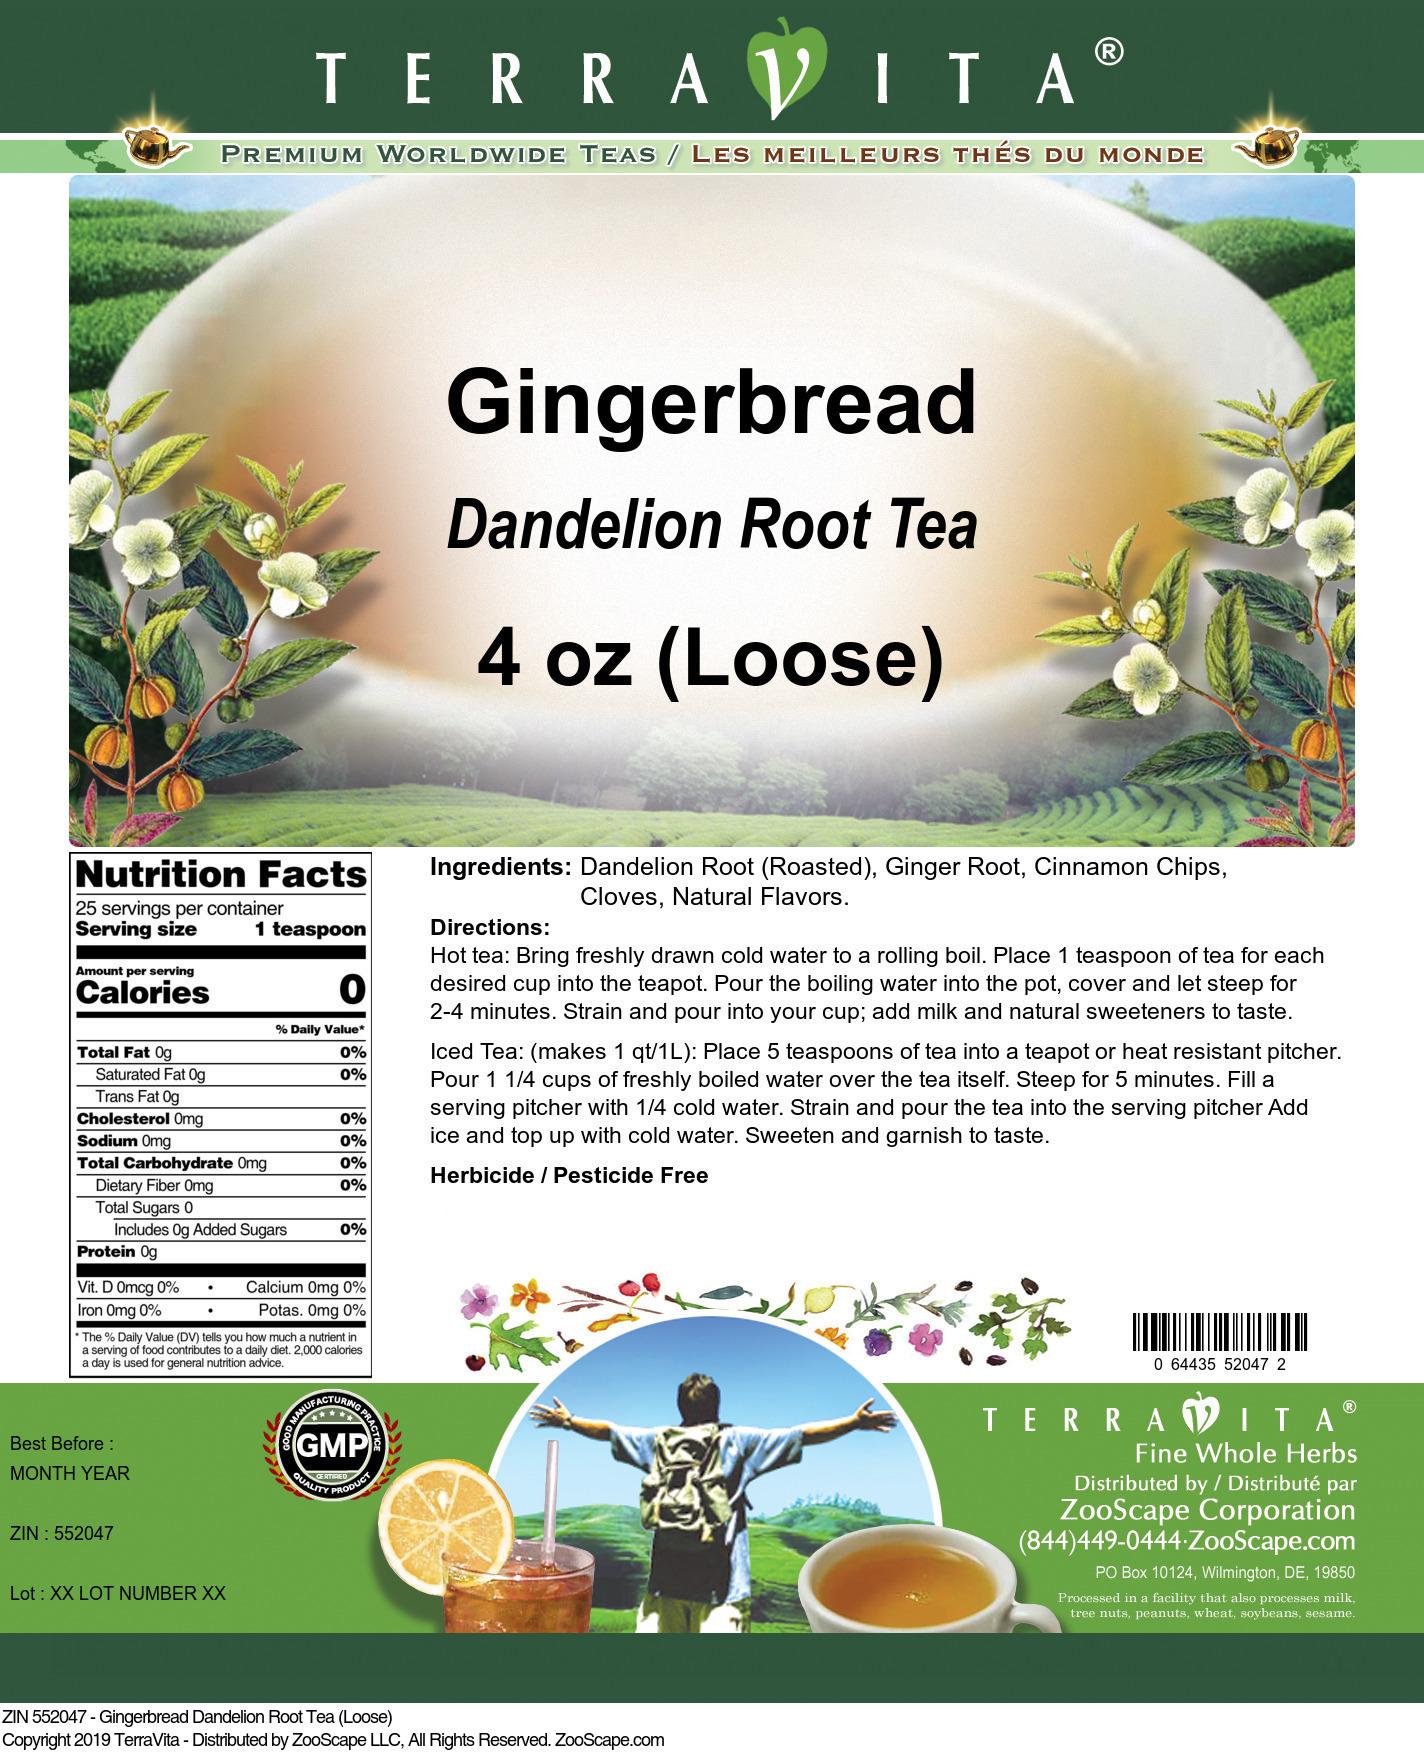 Gingerbread Dandelion Root Tea (Loose)